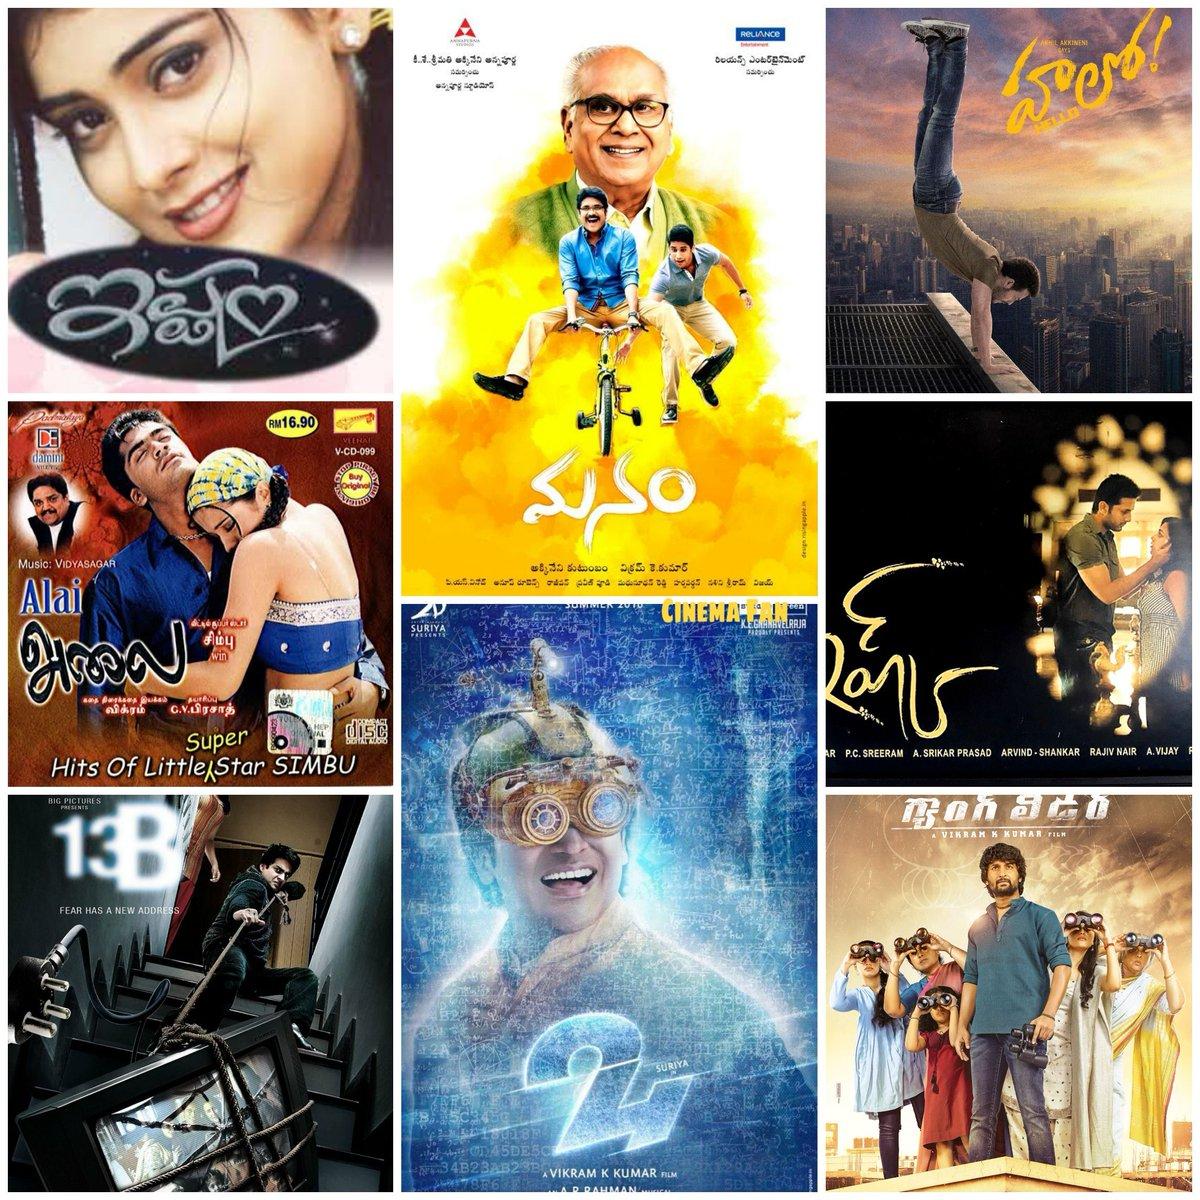 What are your favorites among #VikramKKumar Films 😍😍❤️❤️? #HBDVikramKKumar  #Ishtam #Alai #13B #Manam #24 #Ishq #Hello #Gangleader #ShreyaSaran #Simbu #Maddy #TeamAkkineni #Suriya #Nithiin #Akhil #Nani https://t.co/Sr5JVjBpLC